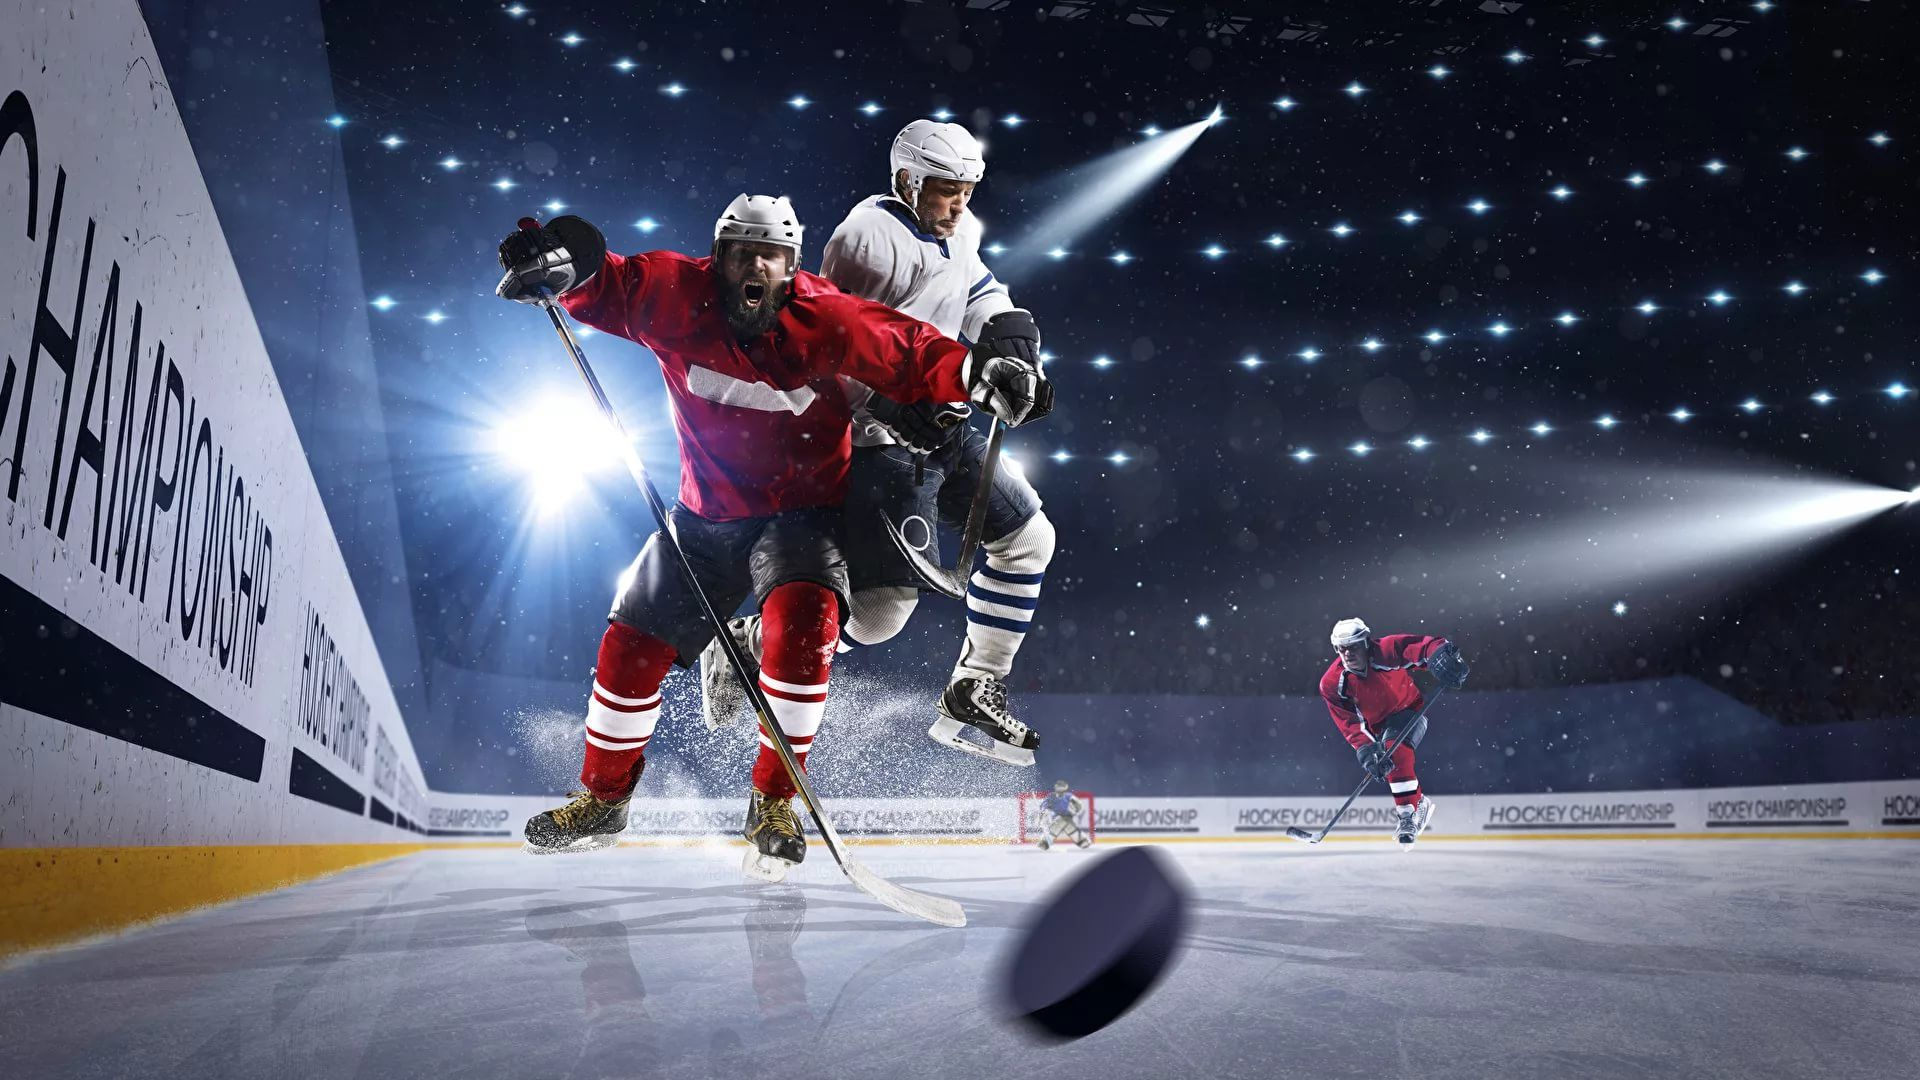 Ice Hockey Pic